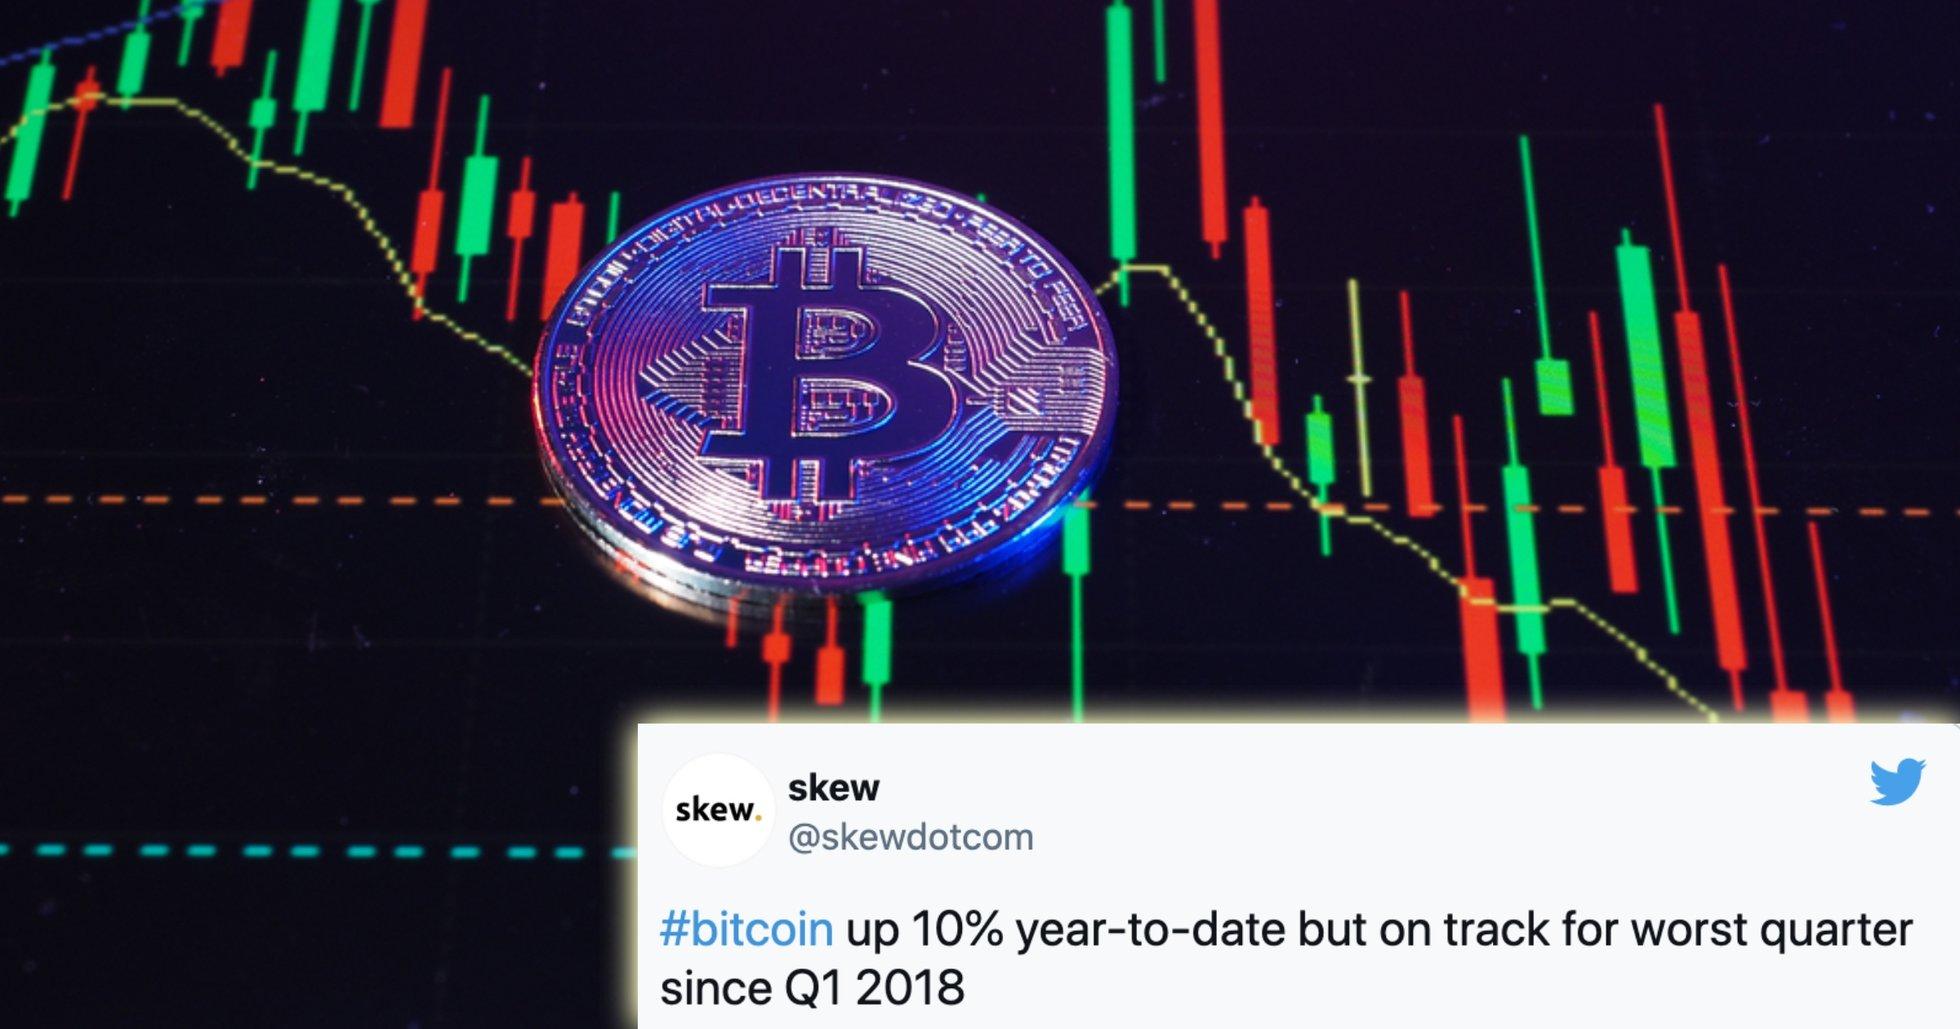 Prekyba akcijomis plus bitcoin - Bitcoin split